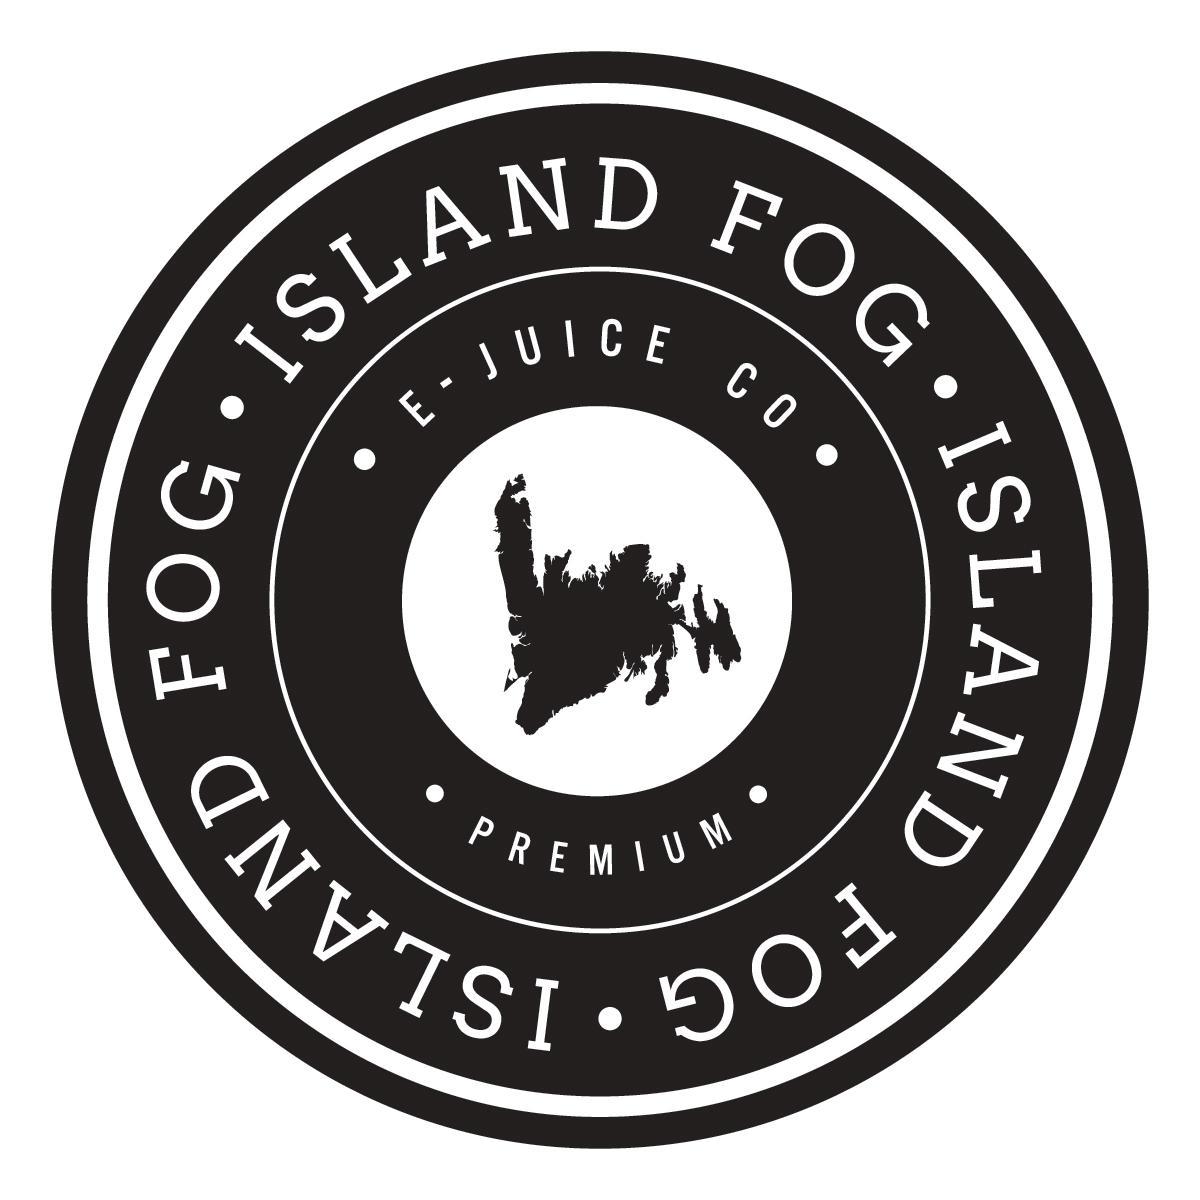 East Coast Distribution - VapeCity à St John's: ECD distributes Island Fog premium ejuice.